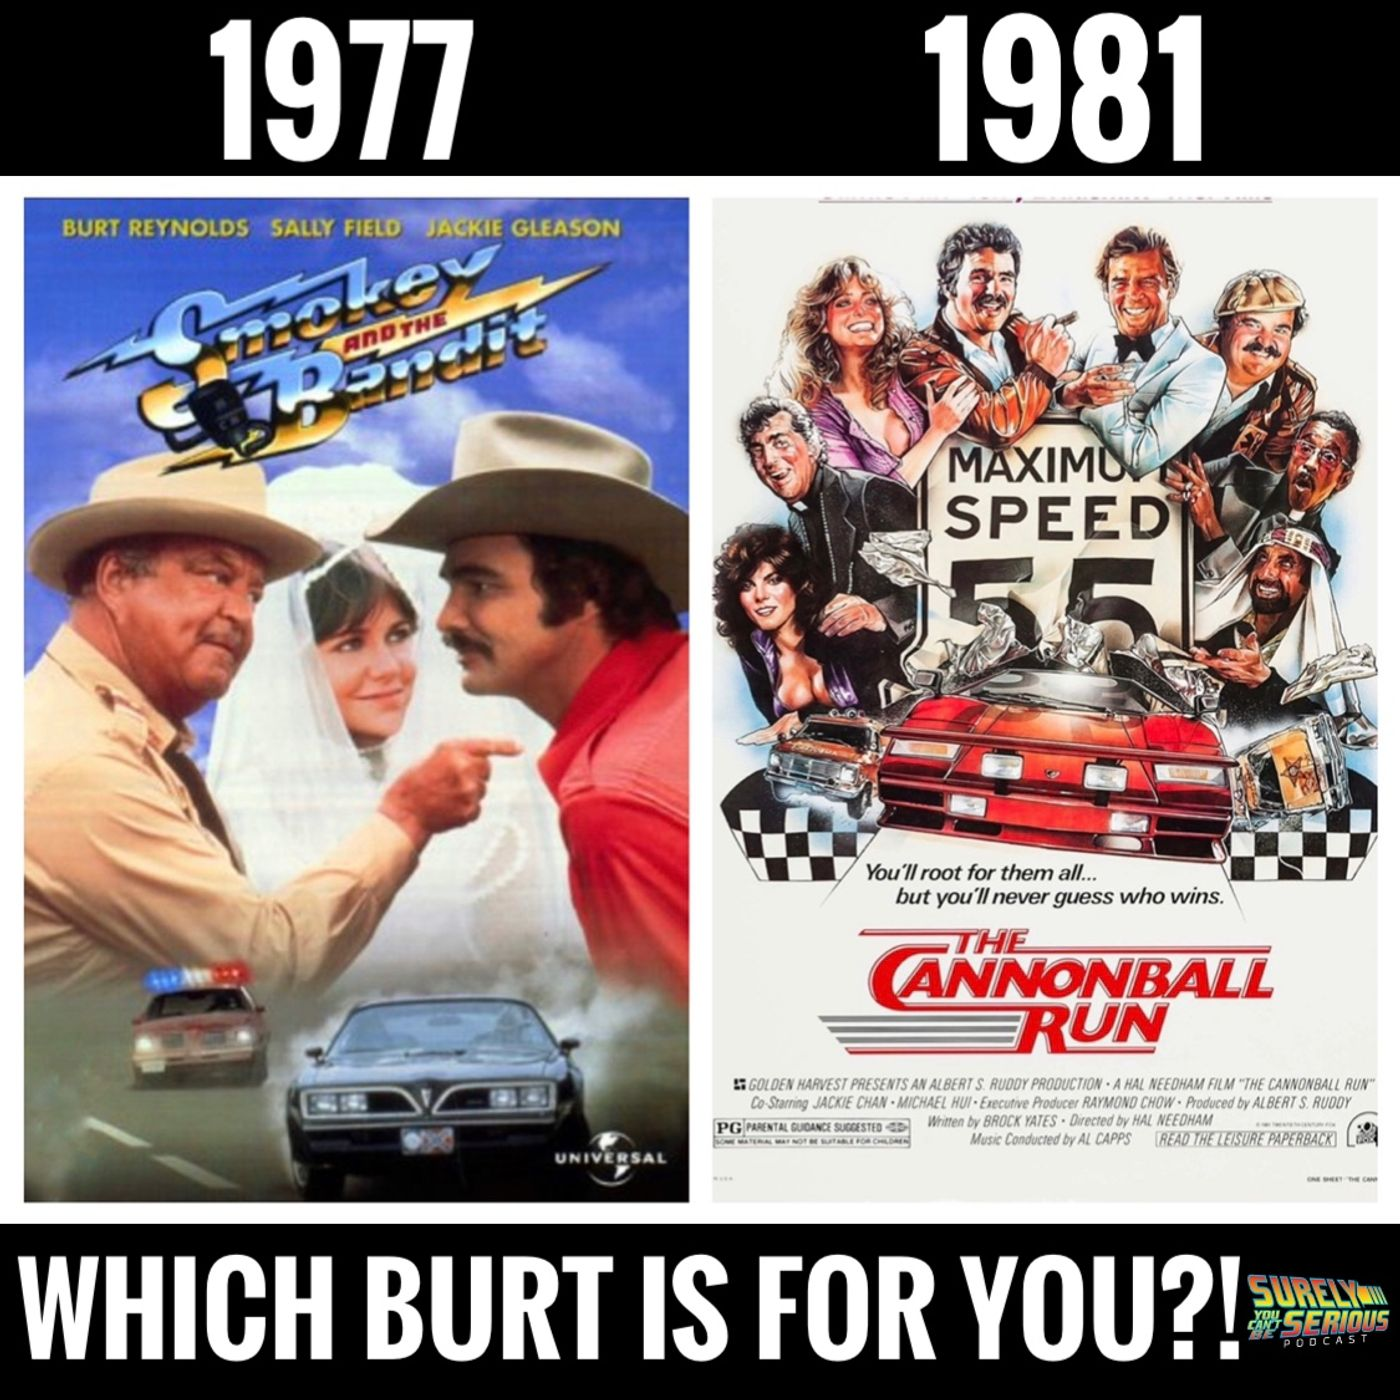 Cannonball Run (1981) vs Smokey and the Bandit (1977)